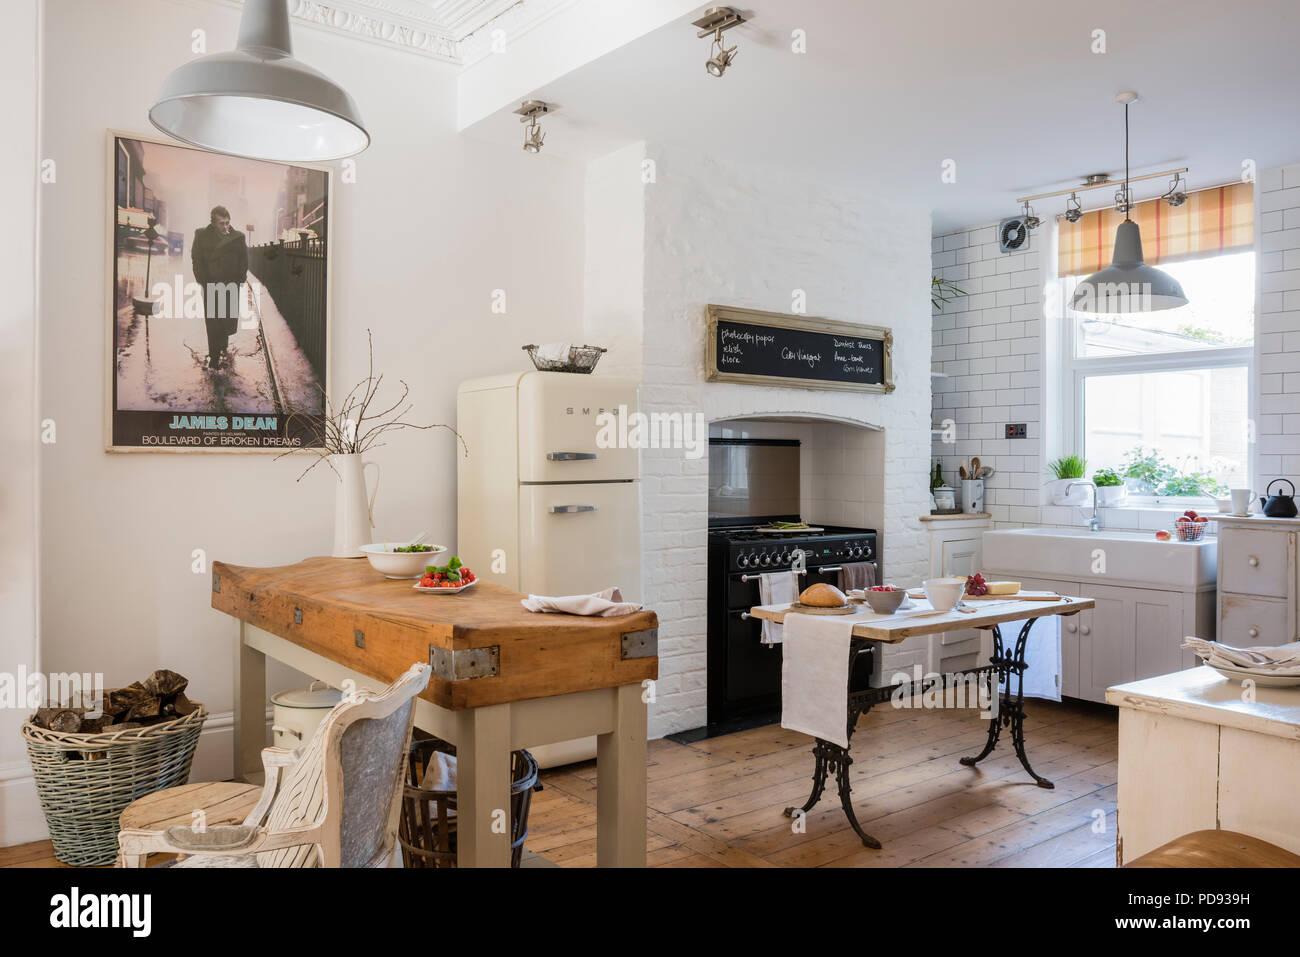 Cucina, stile rustico con un contemporaneo / bordo industriale ...